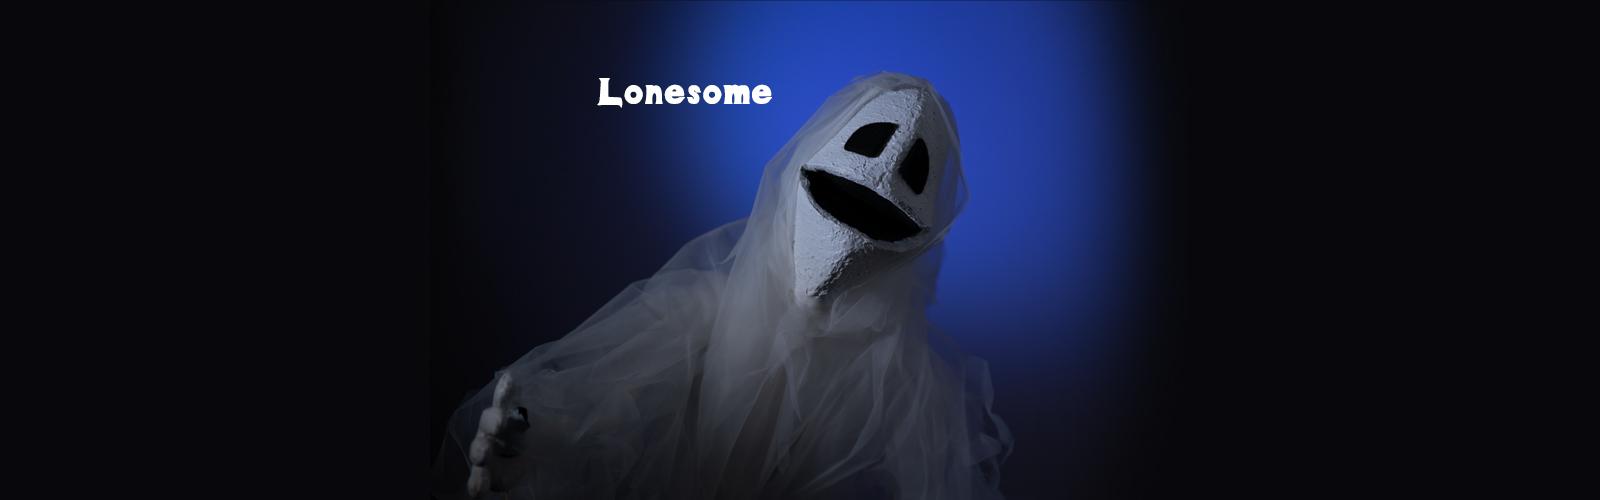 21_Lonesome Slider4